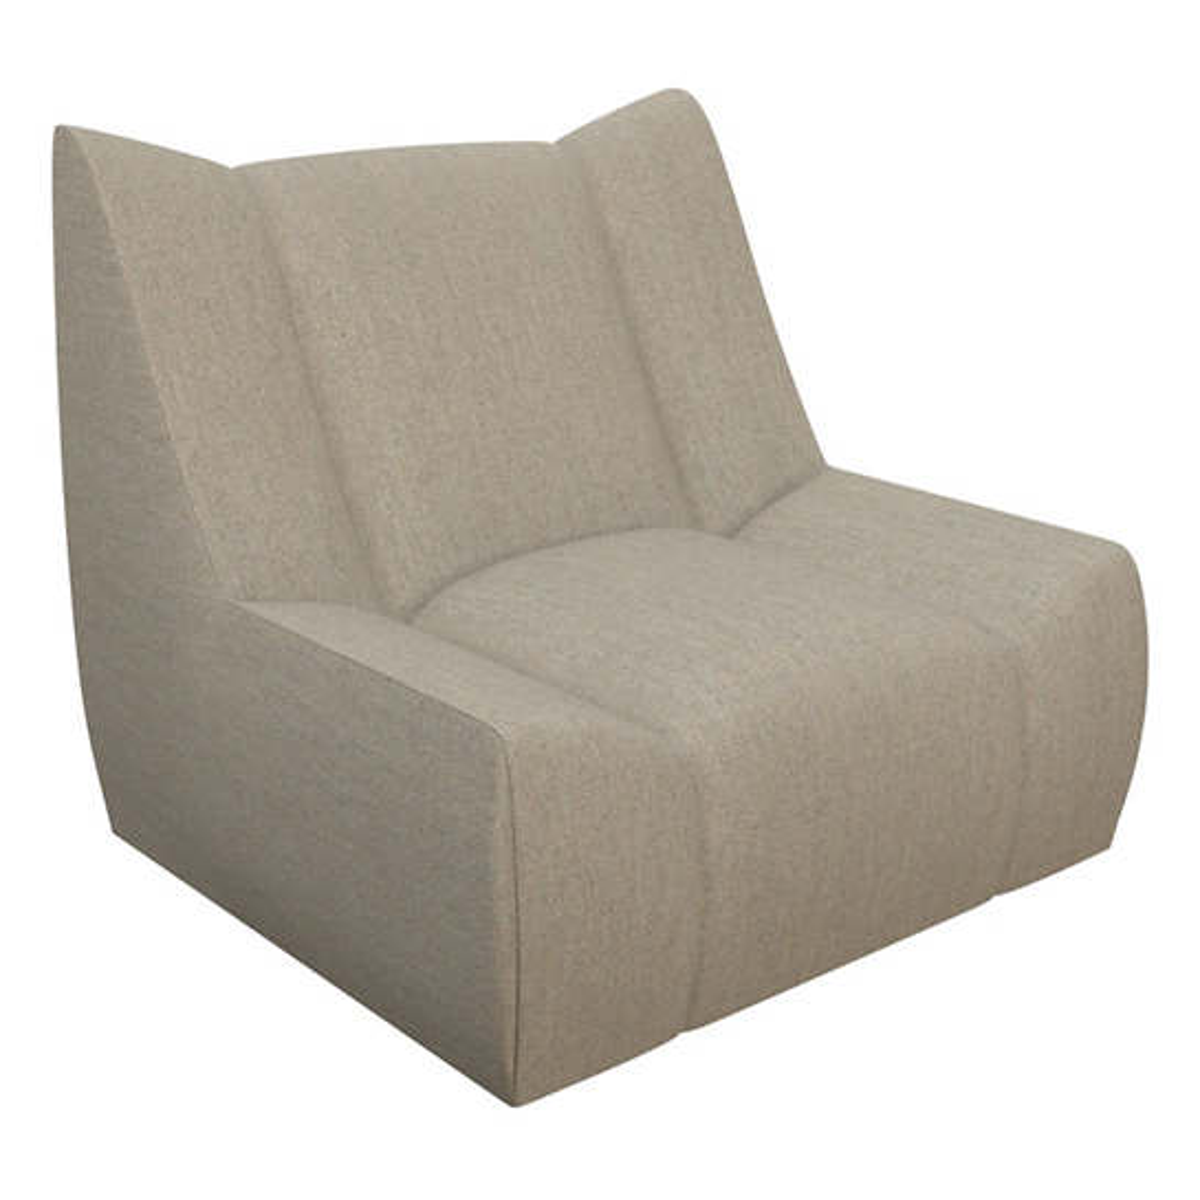 Sunbrella Platinum Heathered Dune Chair